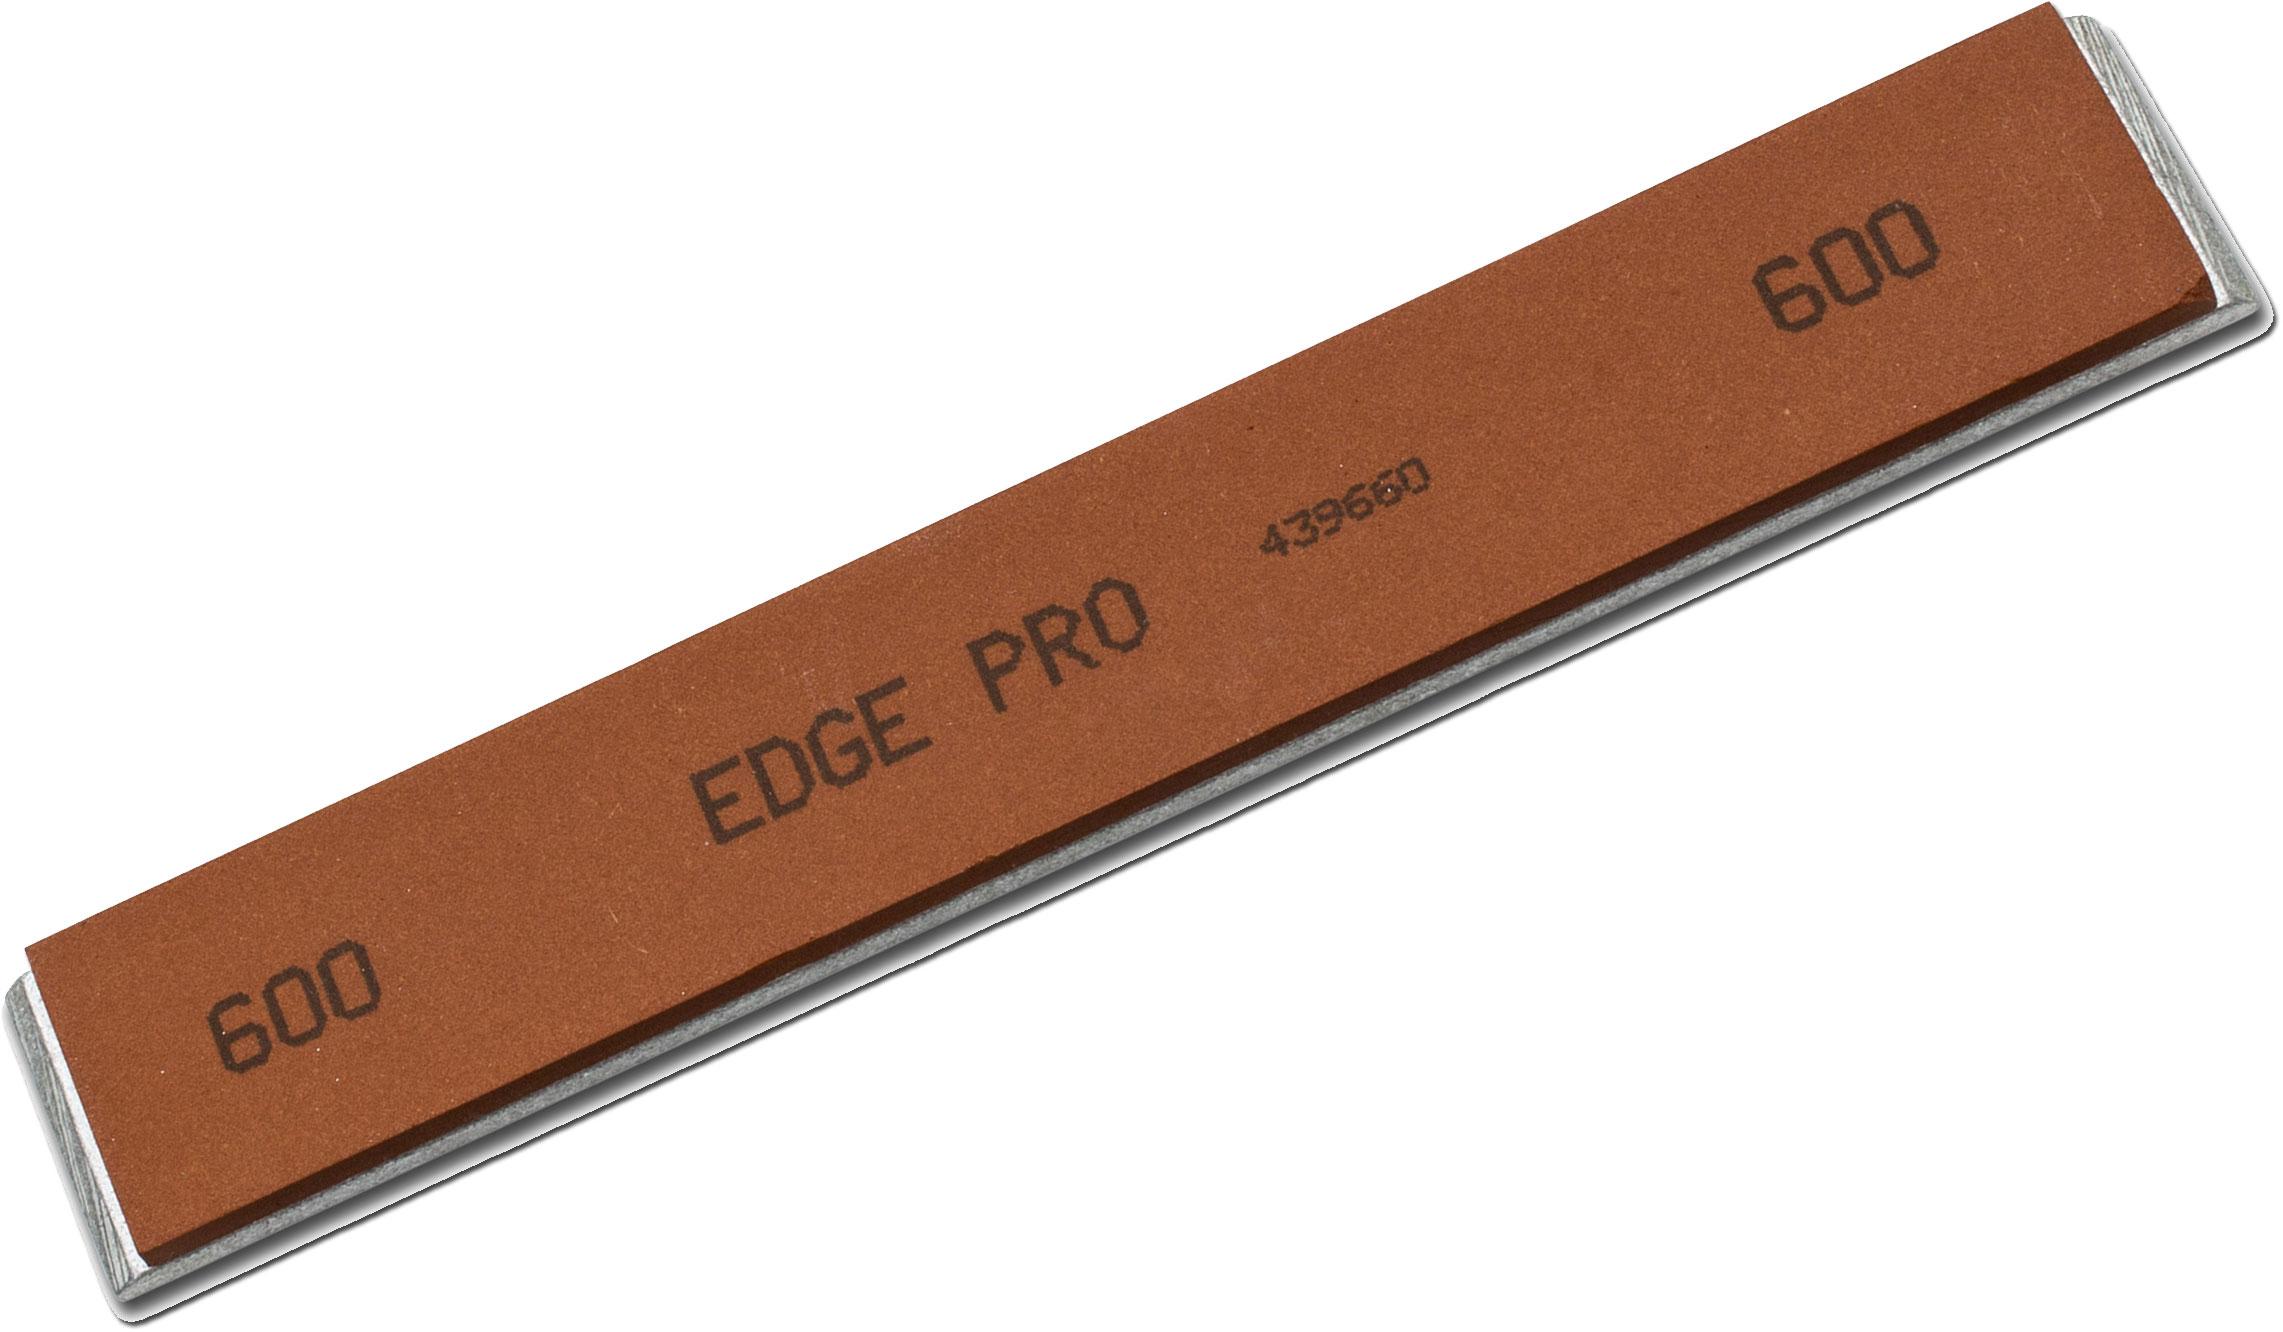 Edge Pro 600 Grit Extra-Fine Aluminum Oxide Water Stone